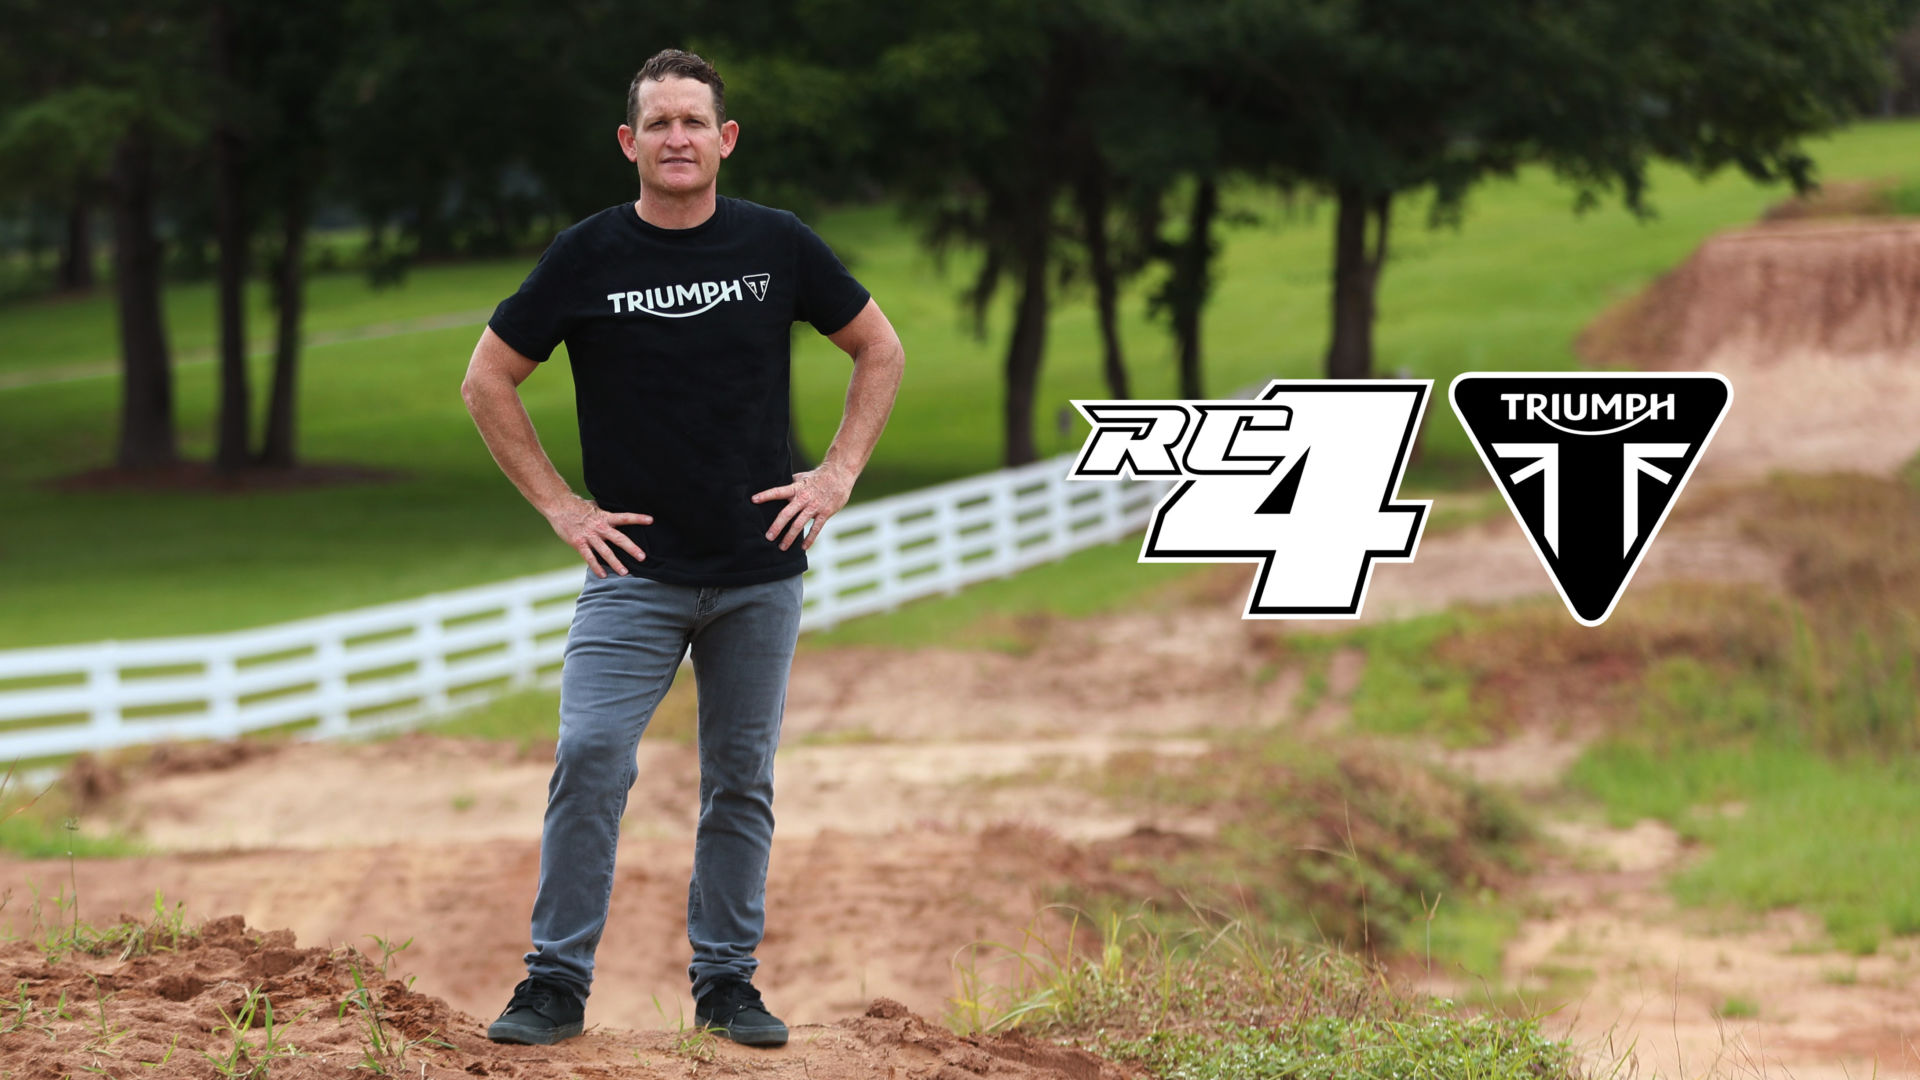 Motocross and Supercross legend Ricky Carmichael is helping Triumph develop motocross models. Photo courtesy Triumph.